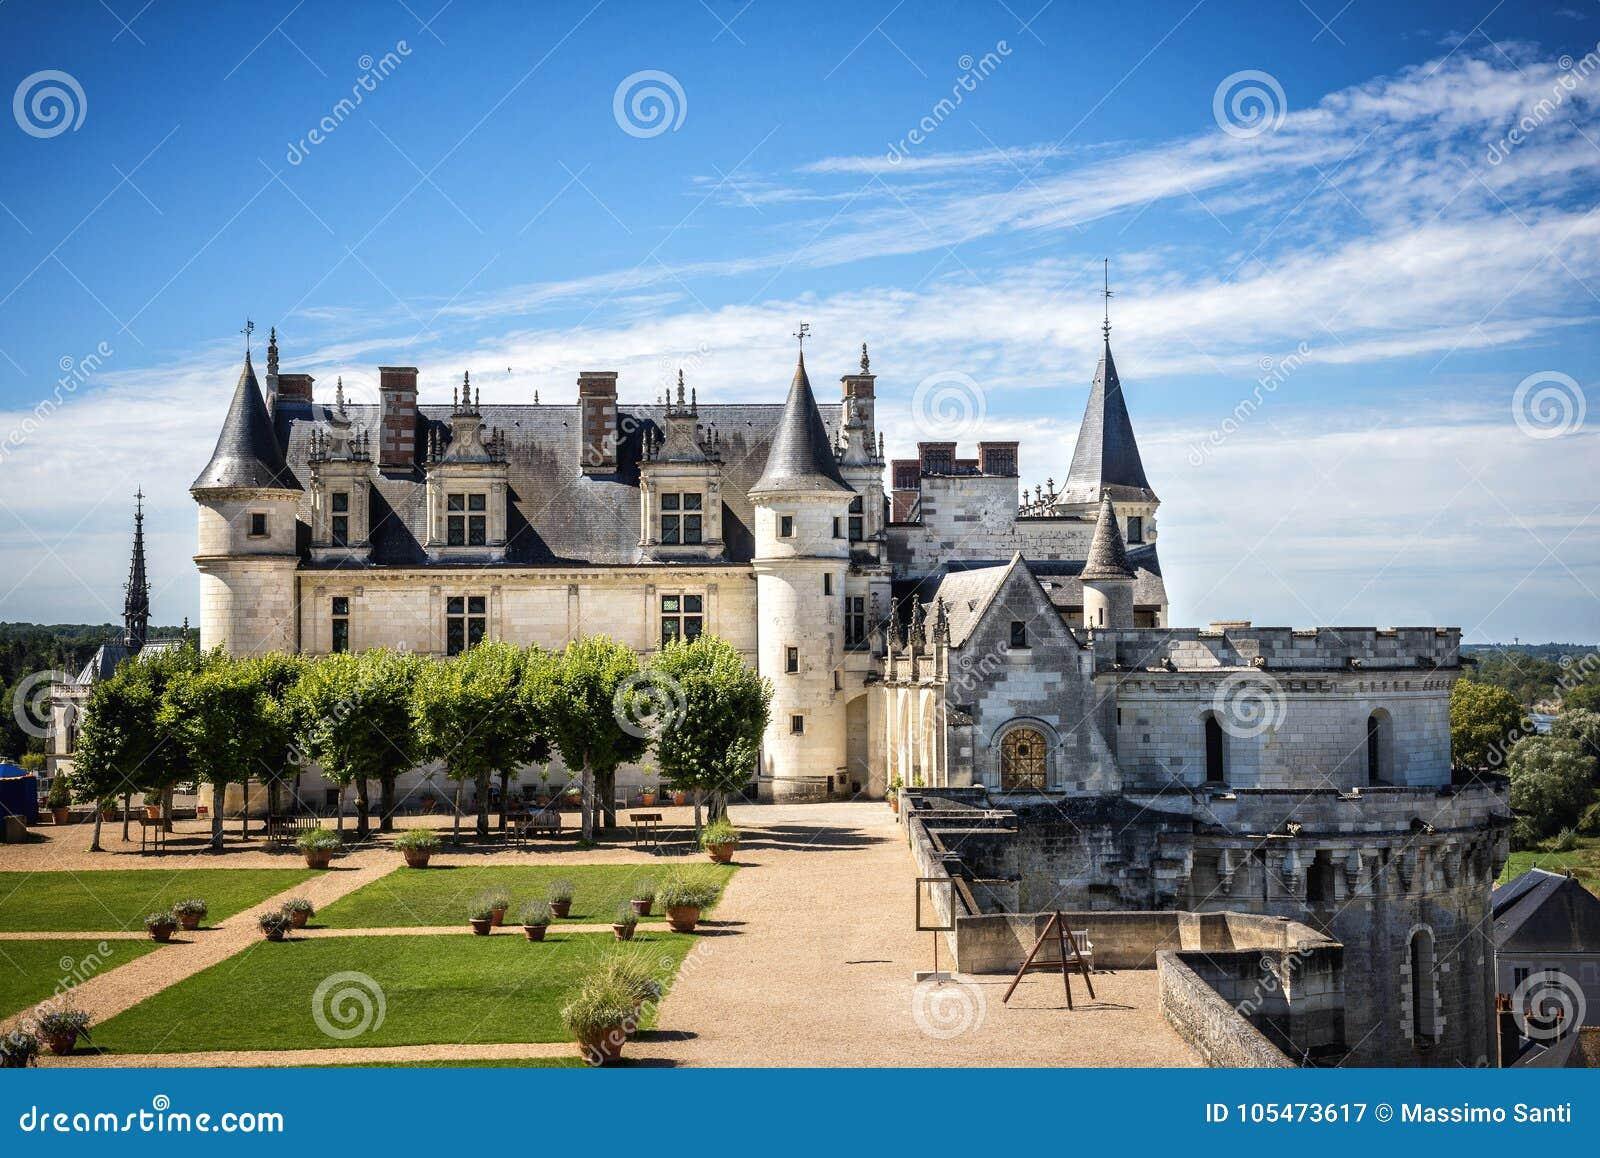 Chateau De Amboise Medieval Castle Leonardo Da Vinci Tomb Loire Valley France Europe Unesco Site Stock Image Image Of Luxury Historical 105473617